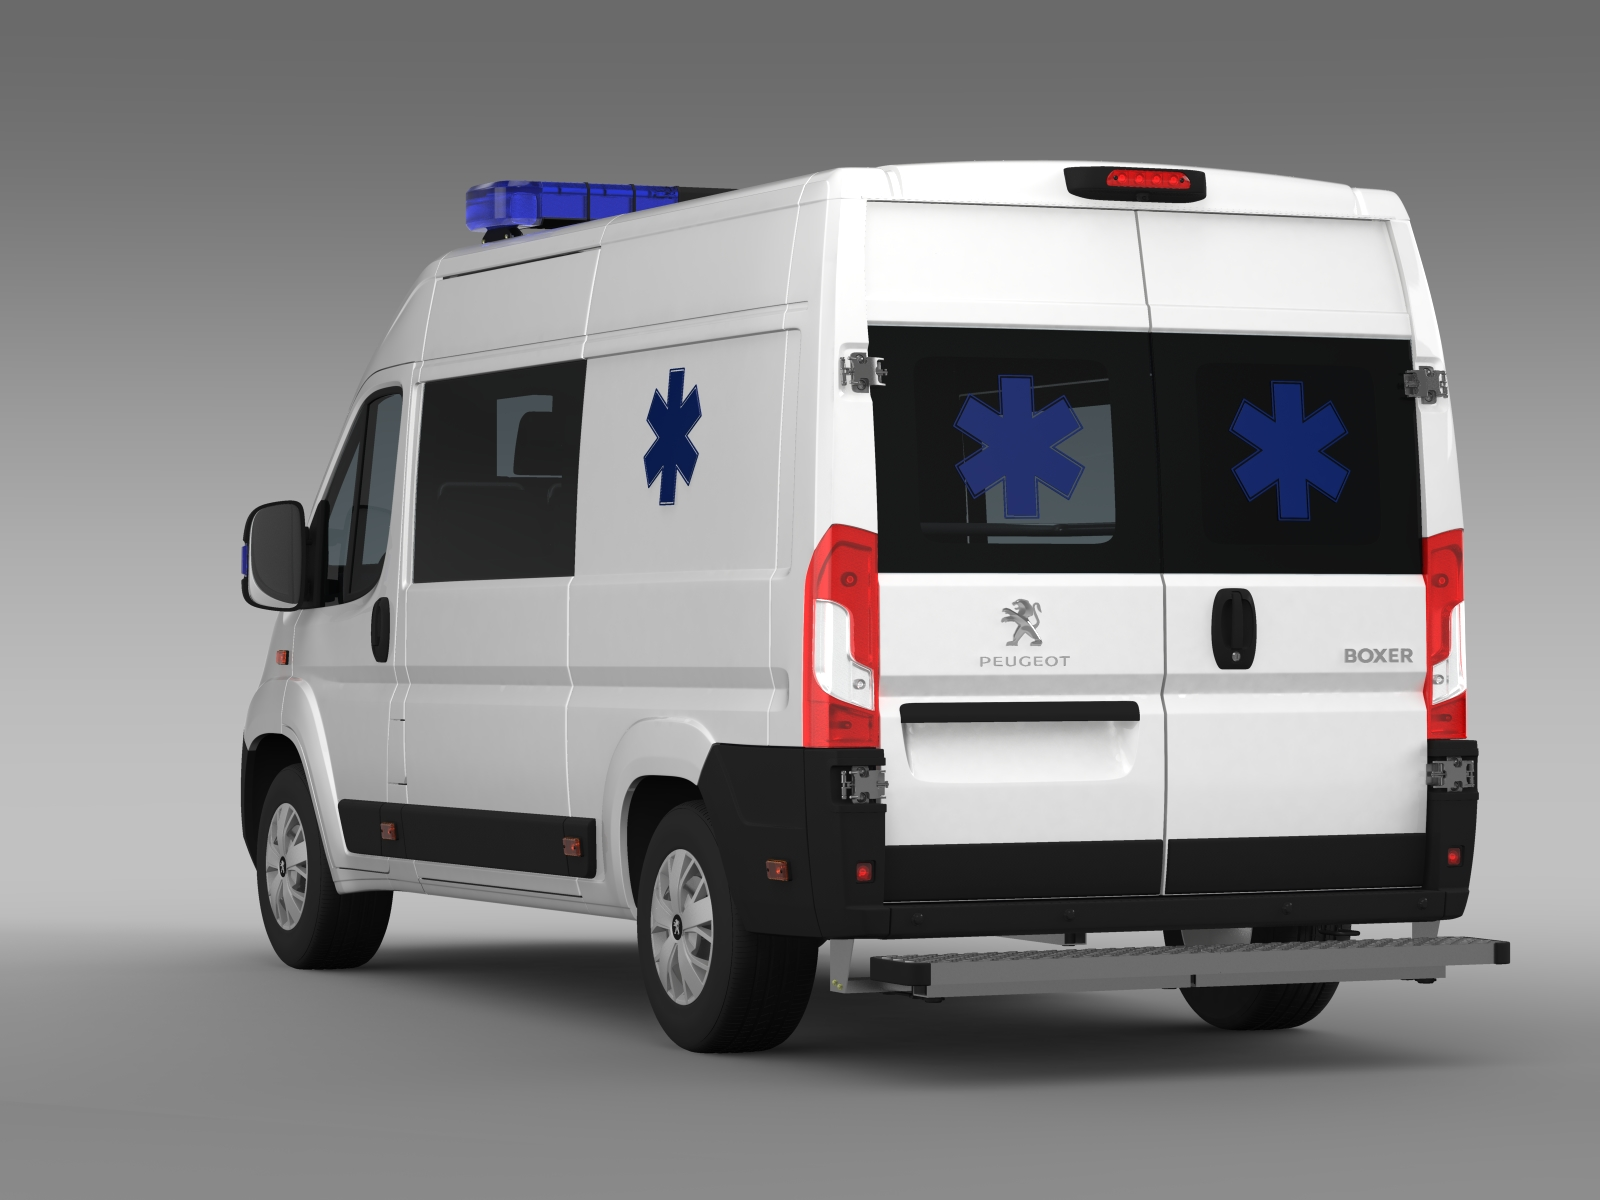 Peugeot Boxer Van Ambulance 2015 3D Model - FlatPyramid